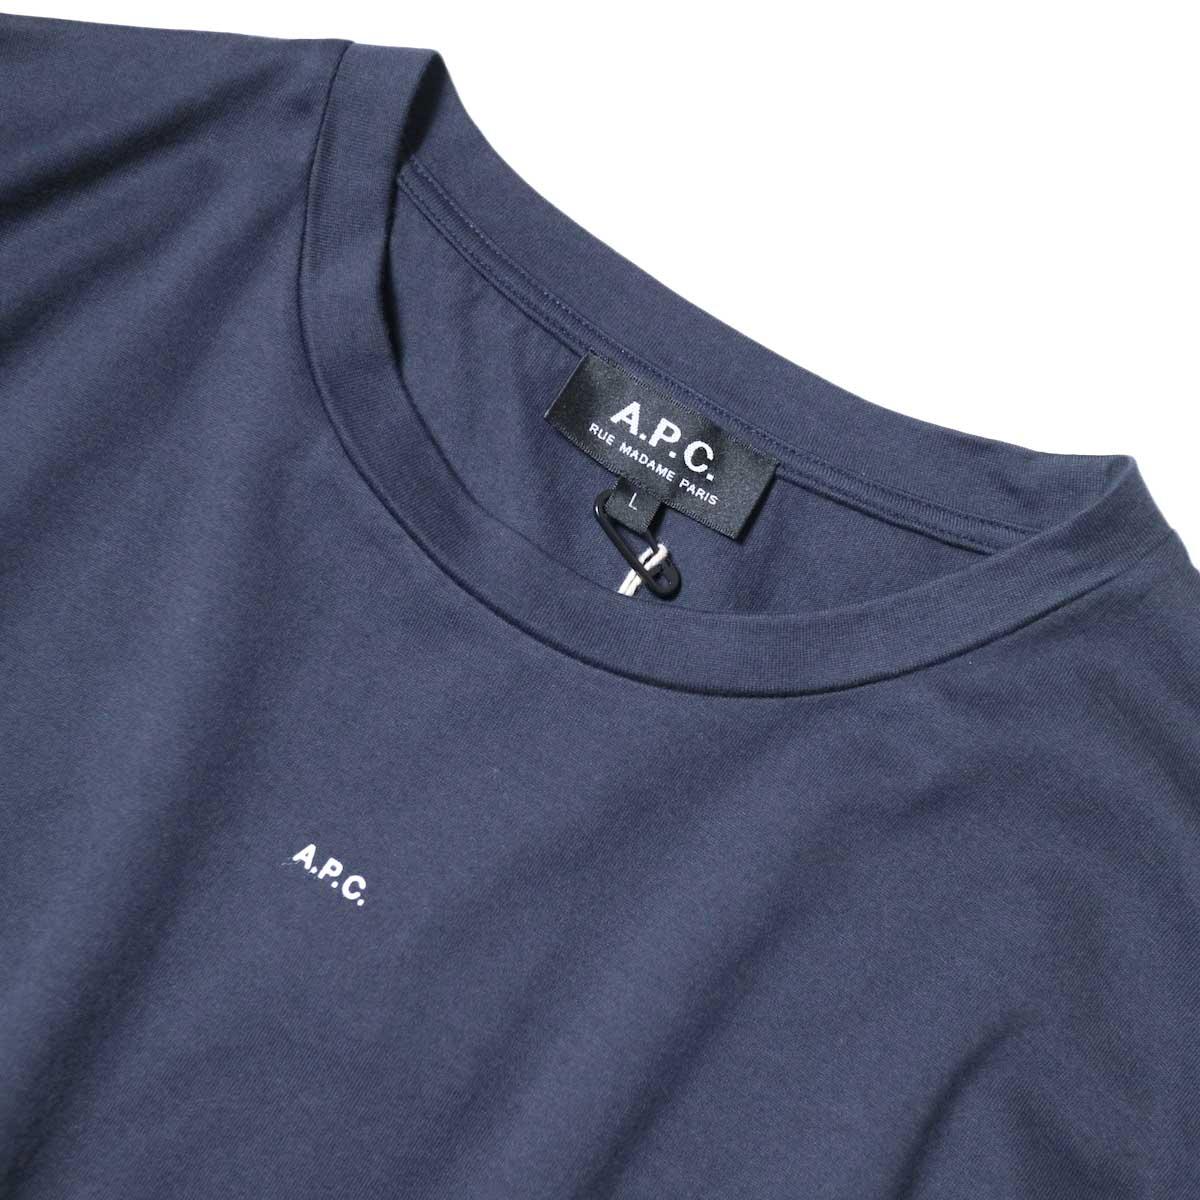 A.P.C. / Jade Tシャツ (Navy) ネック・センターロゴ